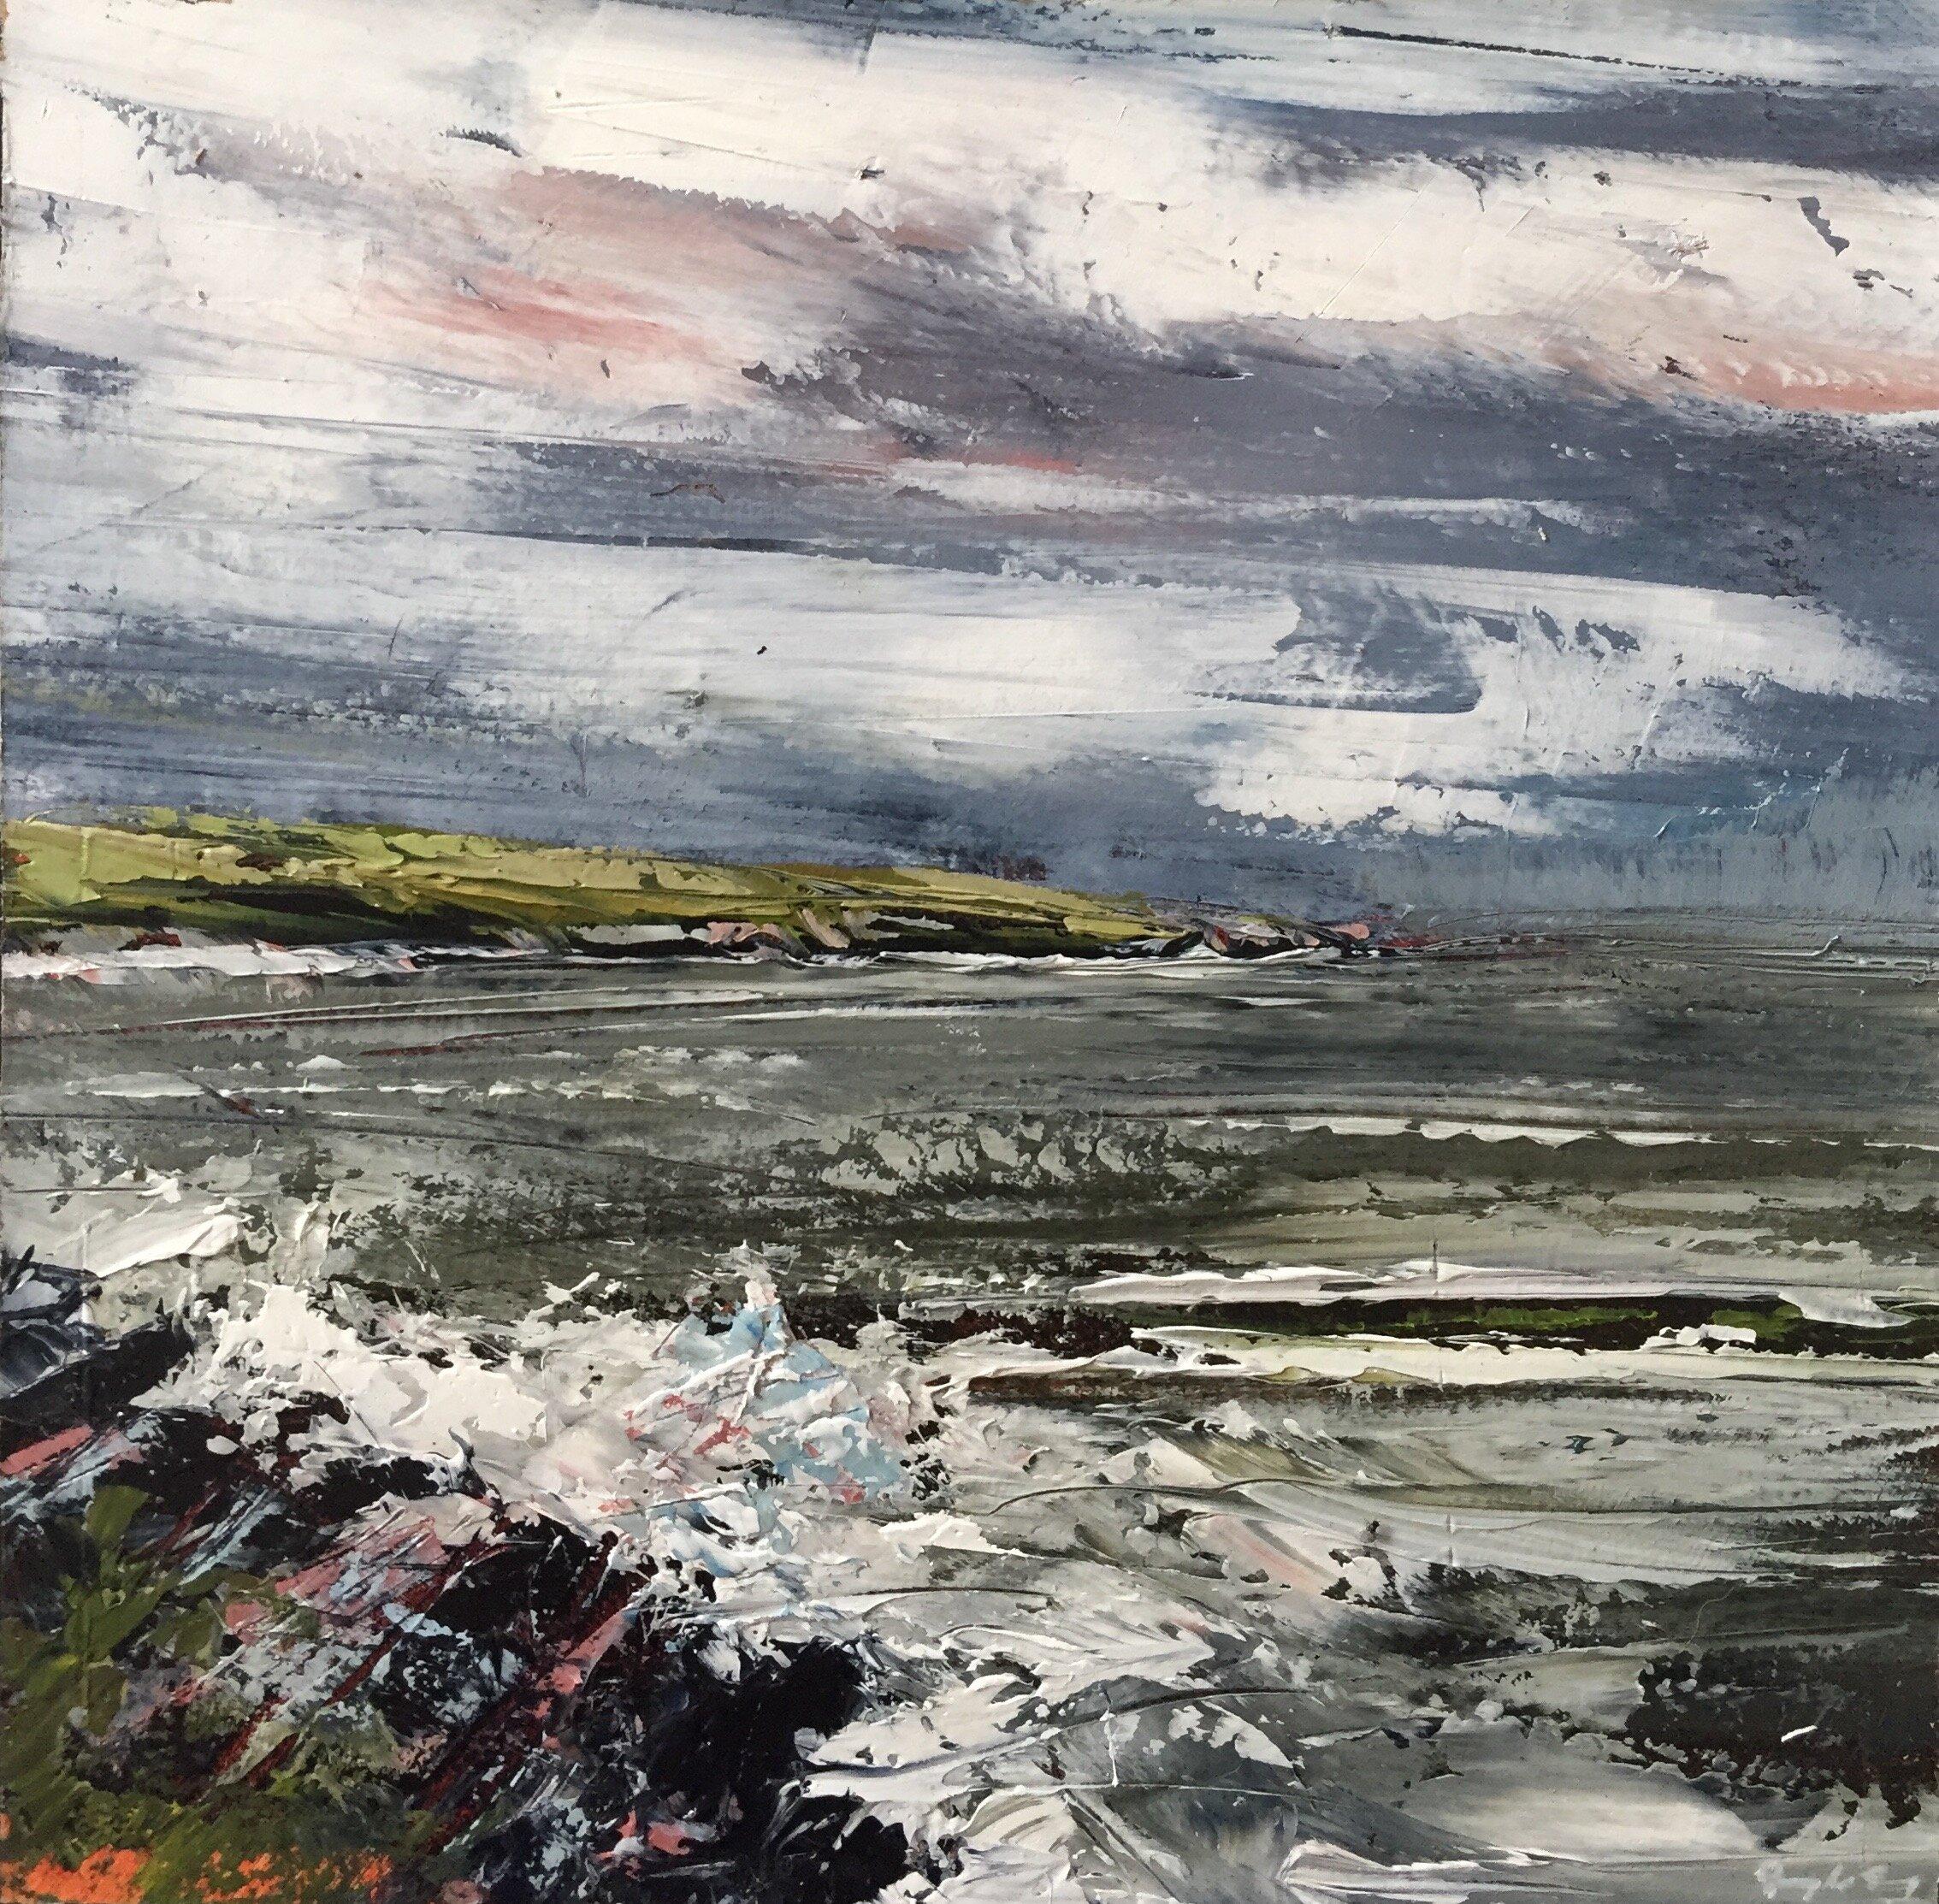 Crewe Bay, Summer 2019 VI  Painting 15cm x 15cm. Frame 40cm x 40cm. Oil on board.  €295